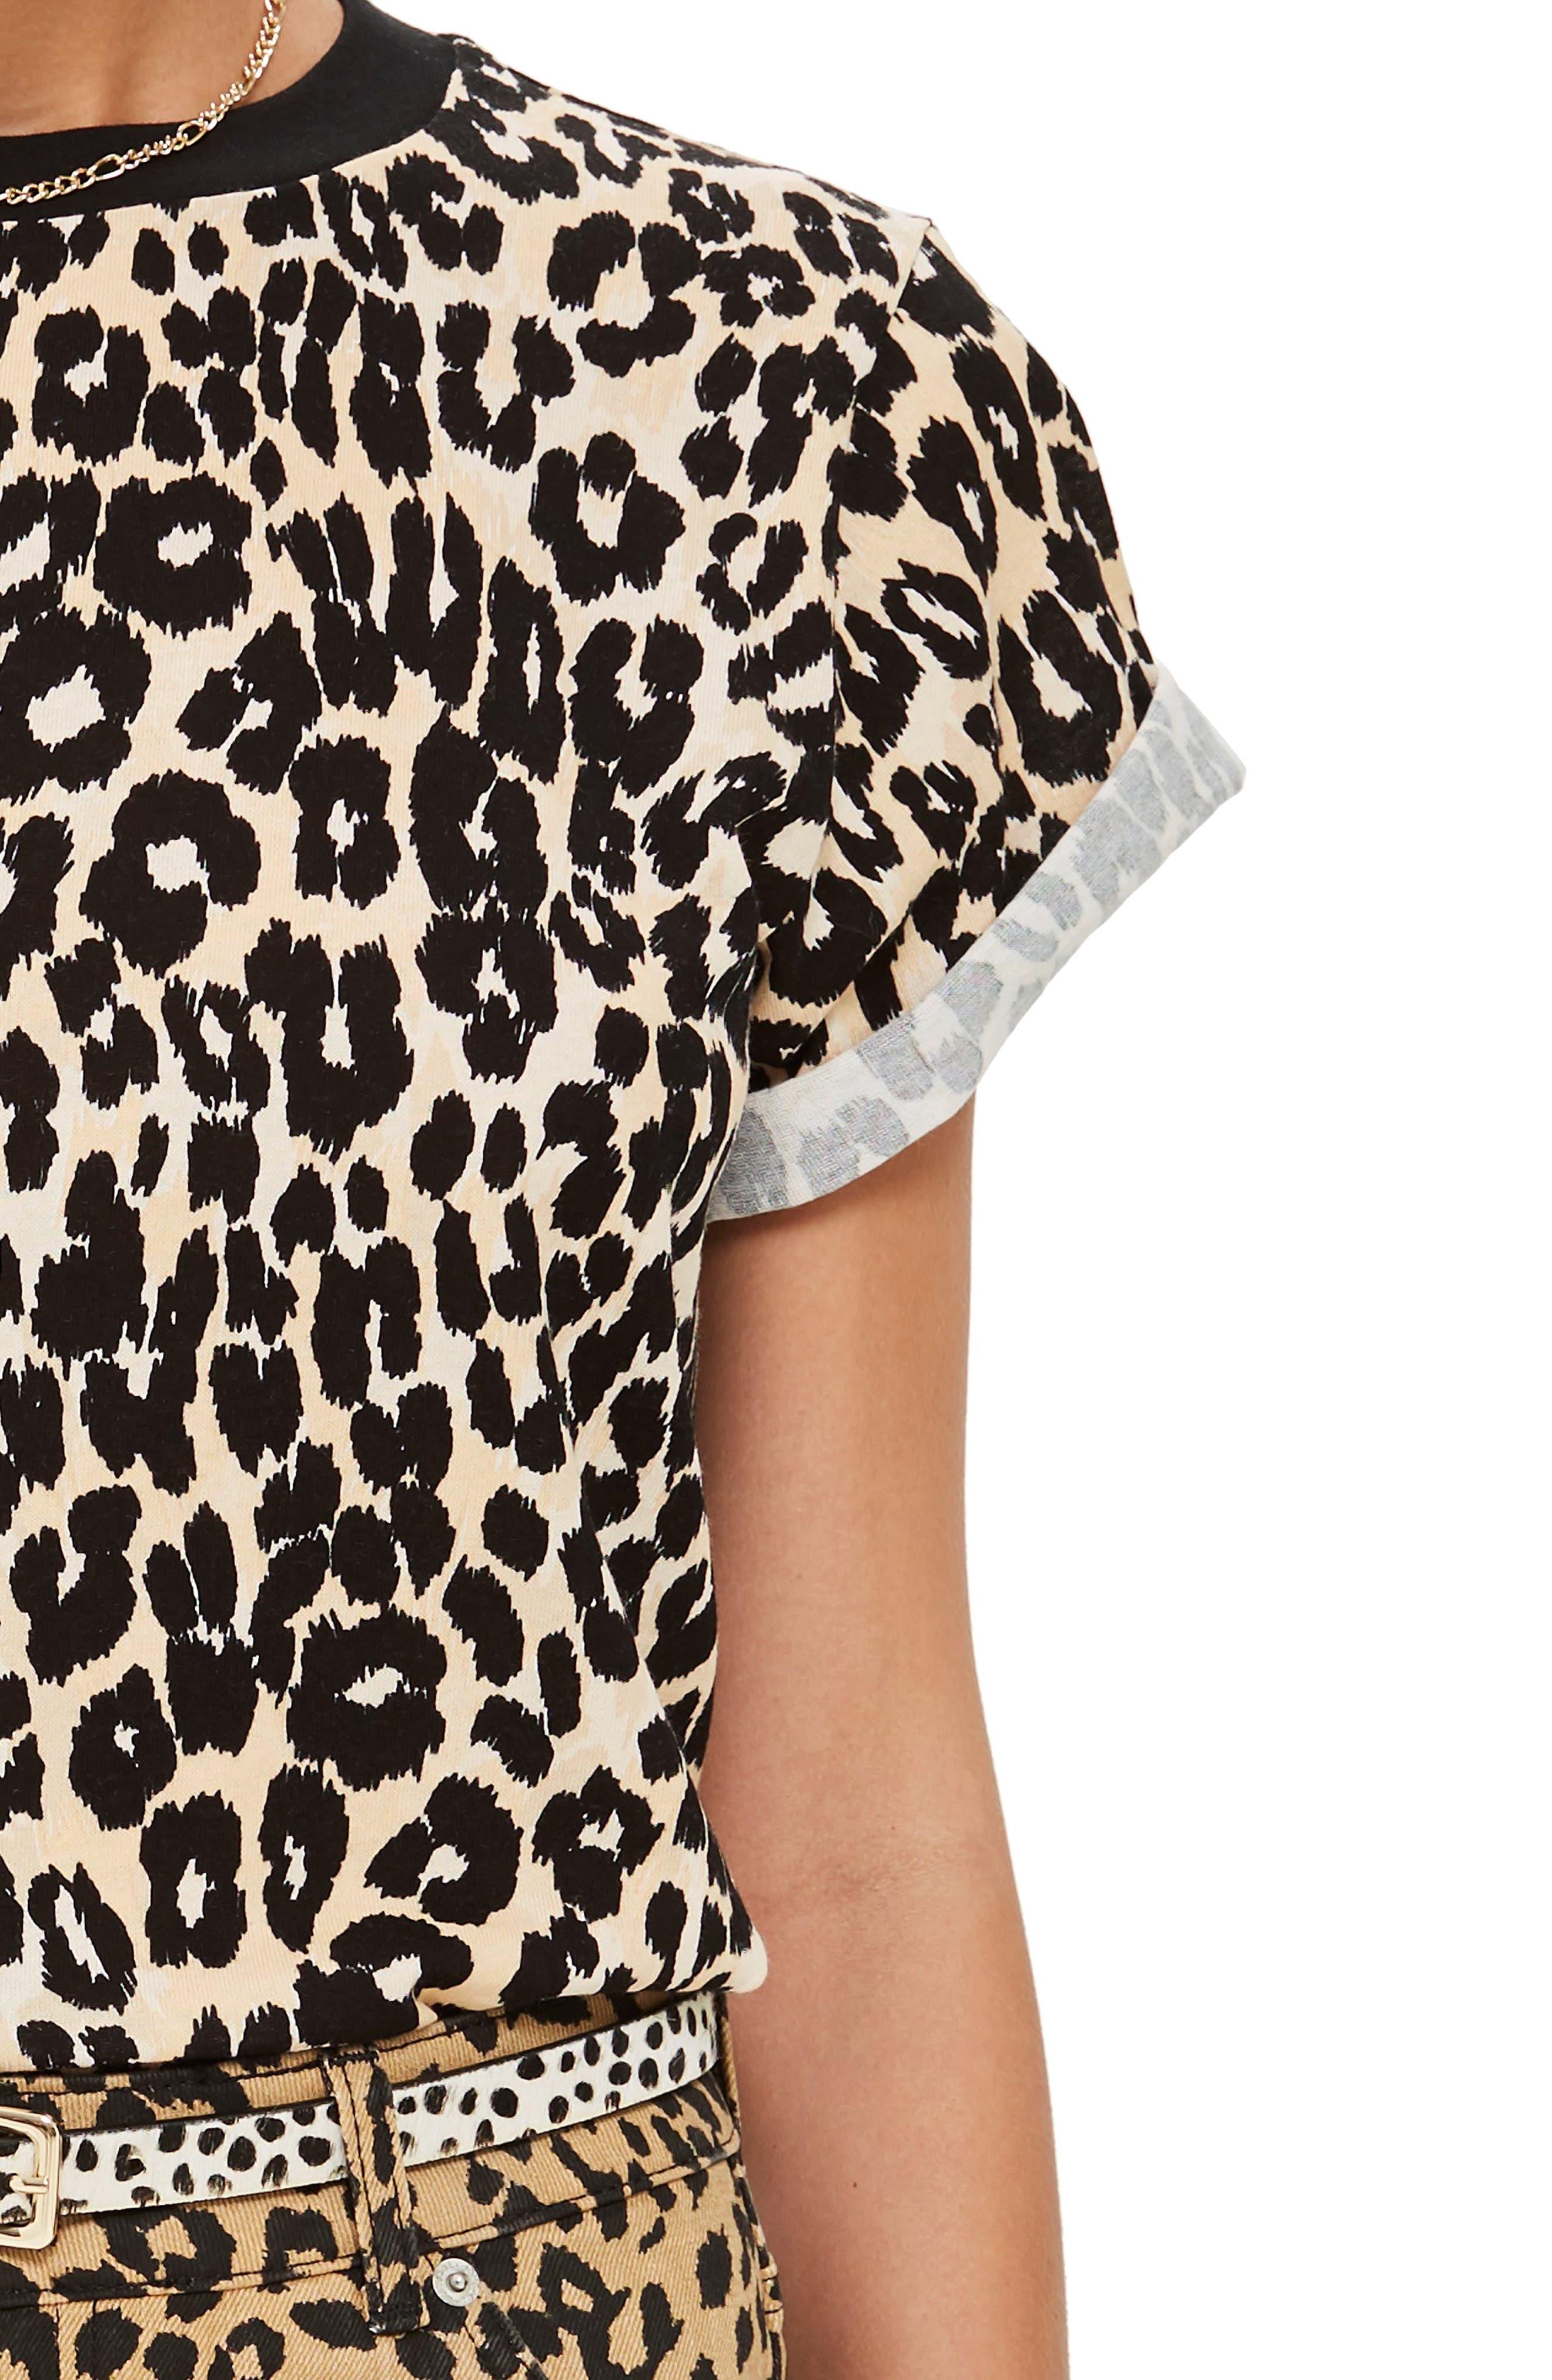 TOPSHOP, Leopard Print Tee, Alternate thumbnail 3, color, 001